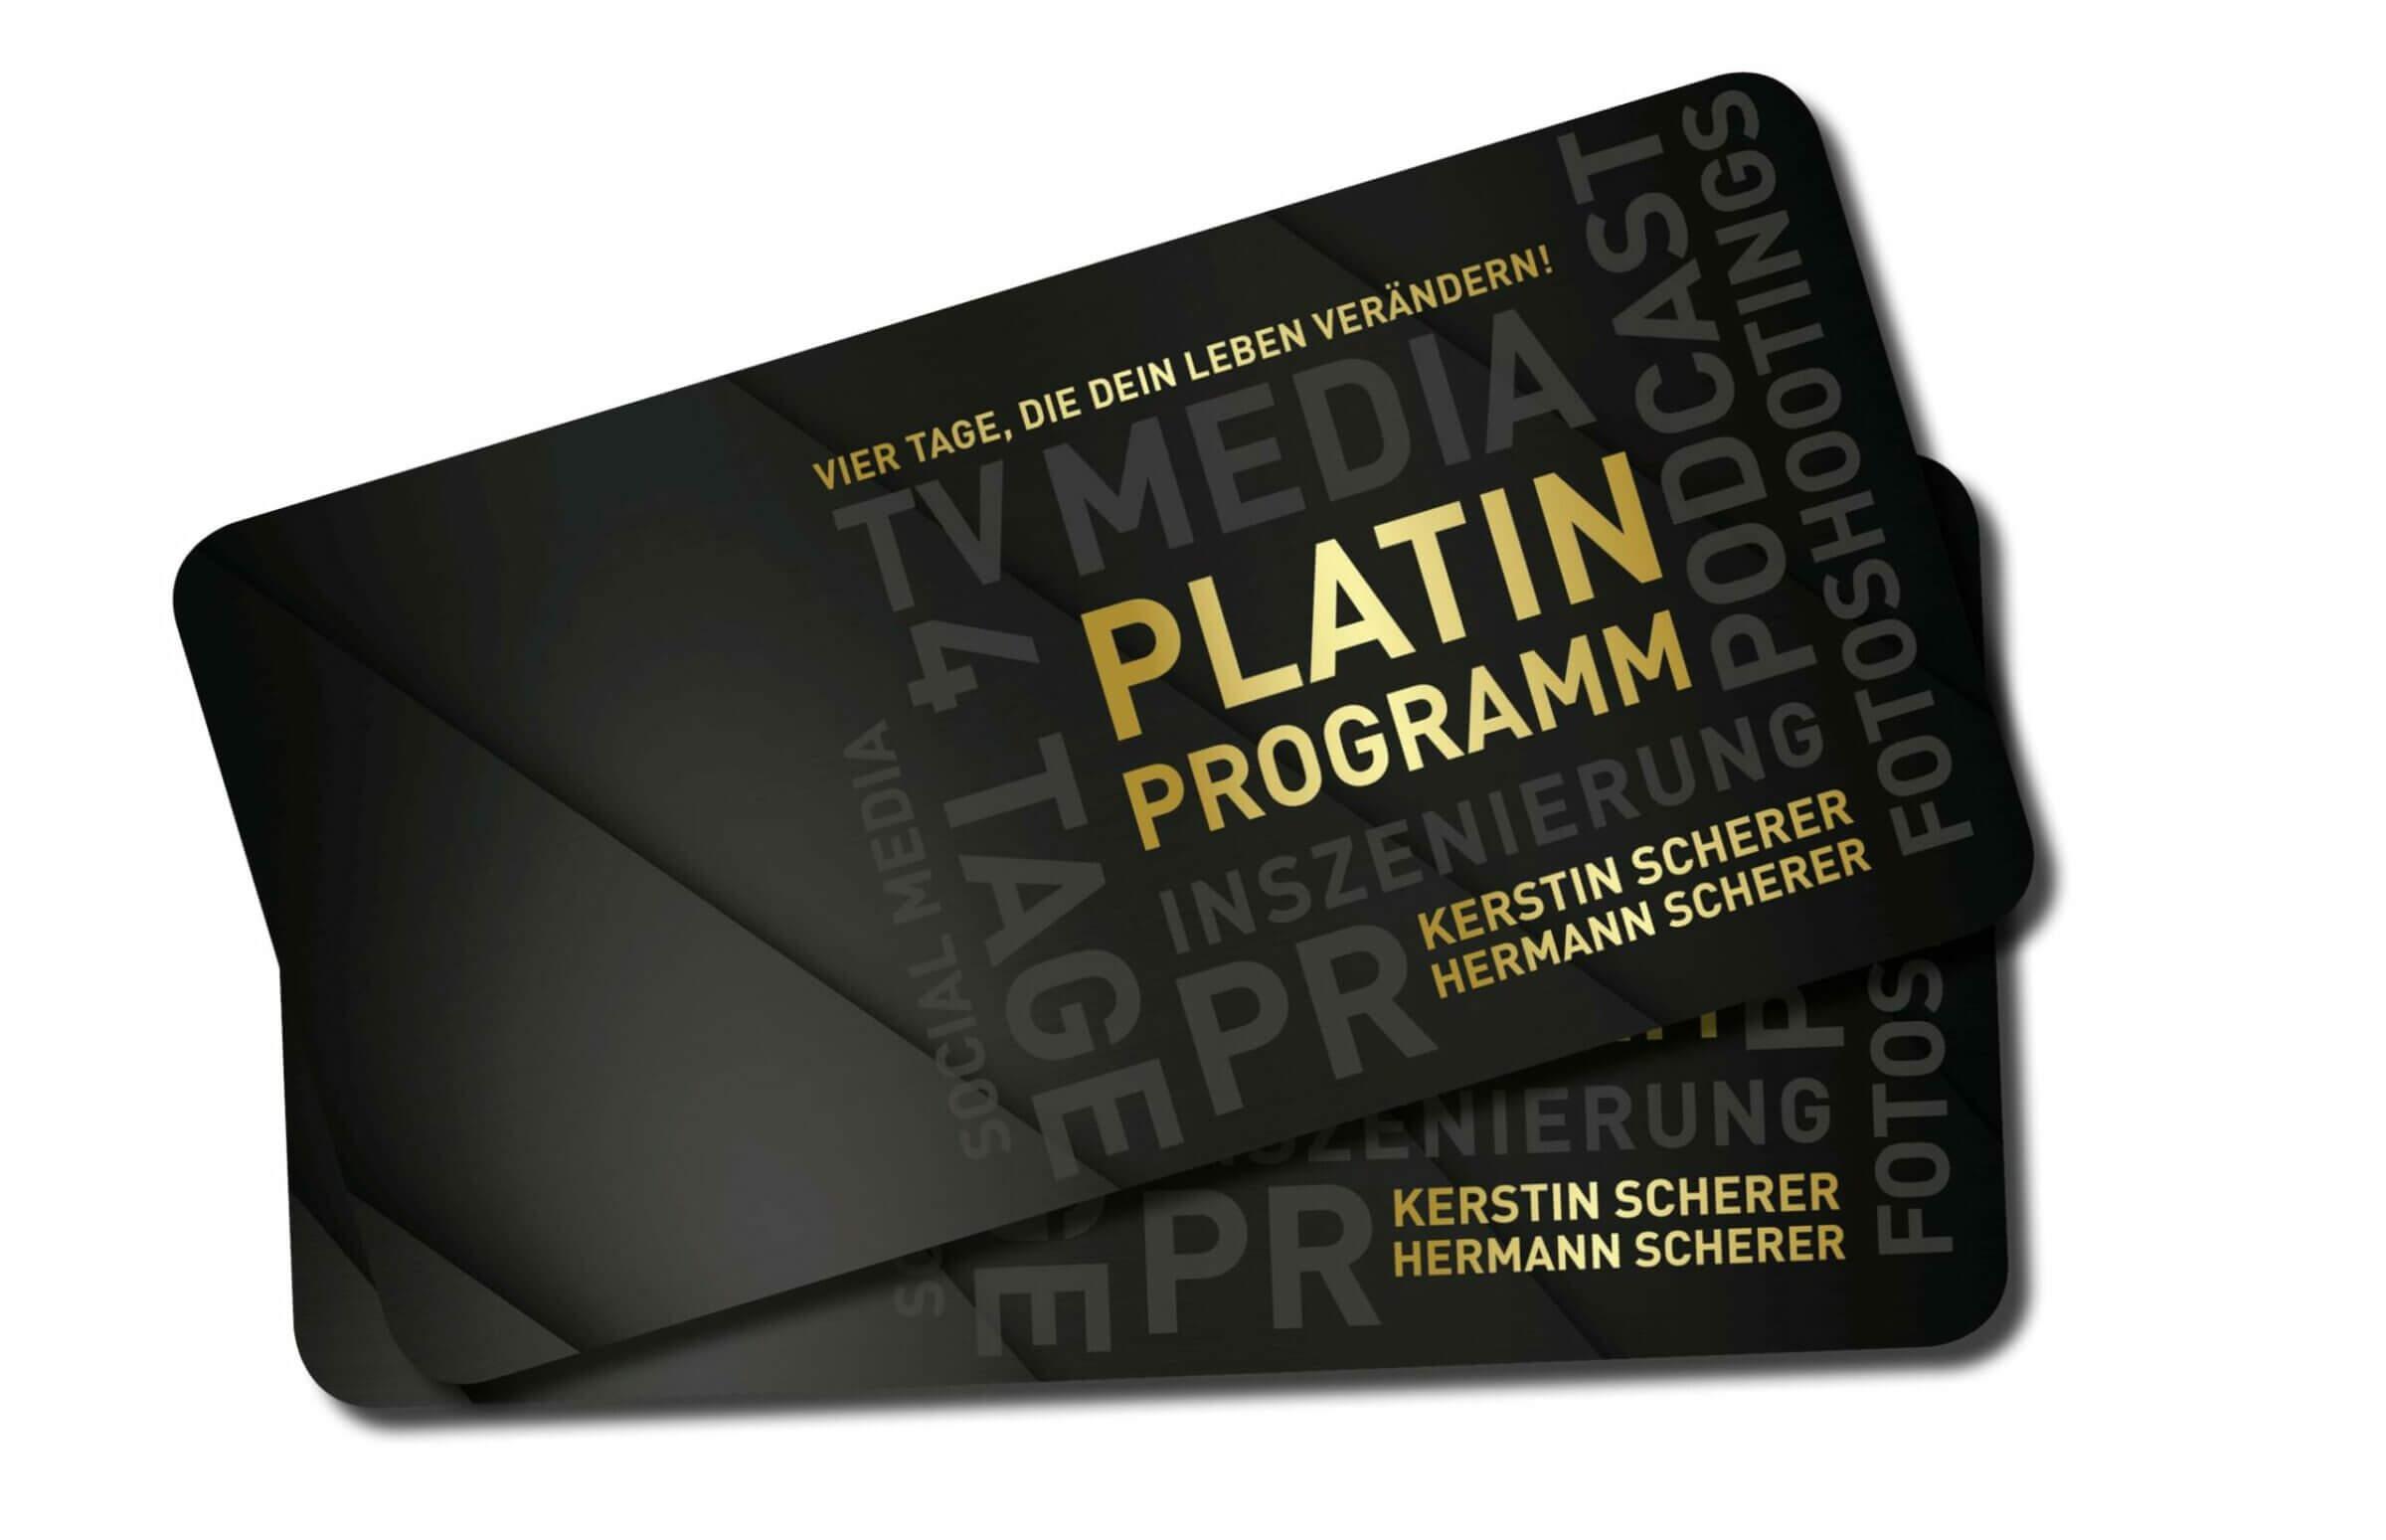 Hermann Scherer Platin - Programm